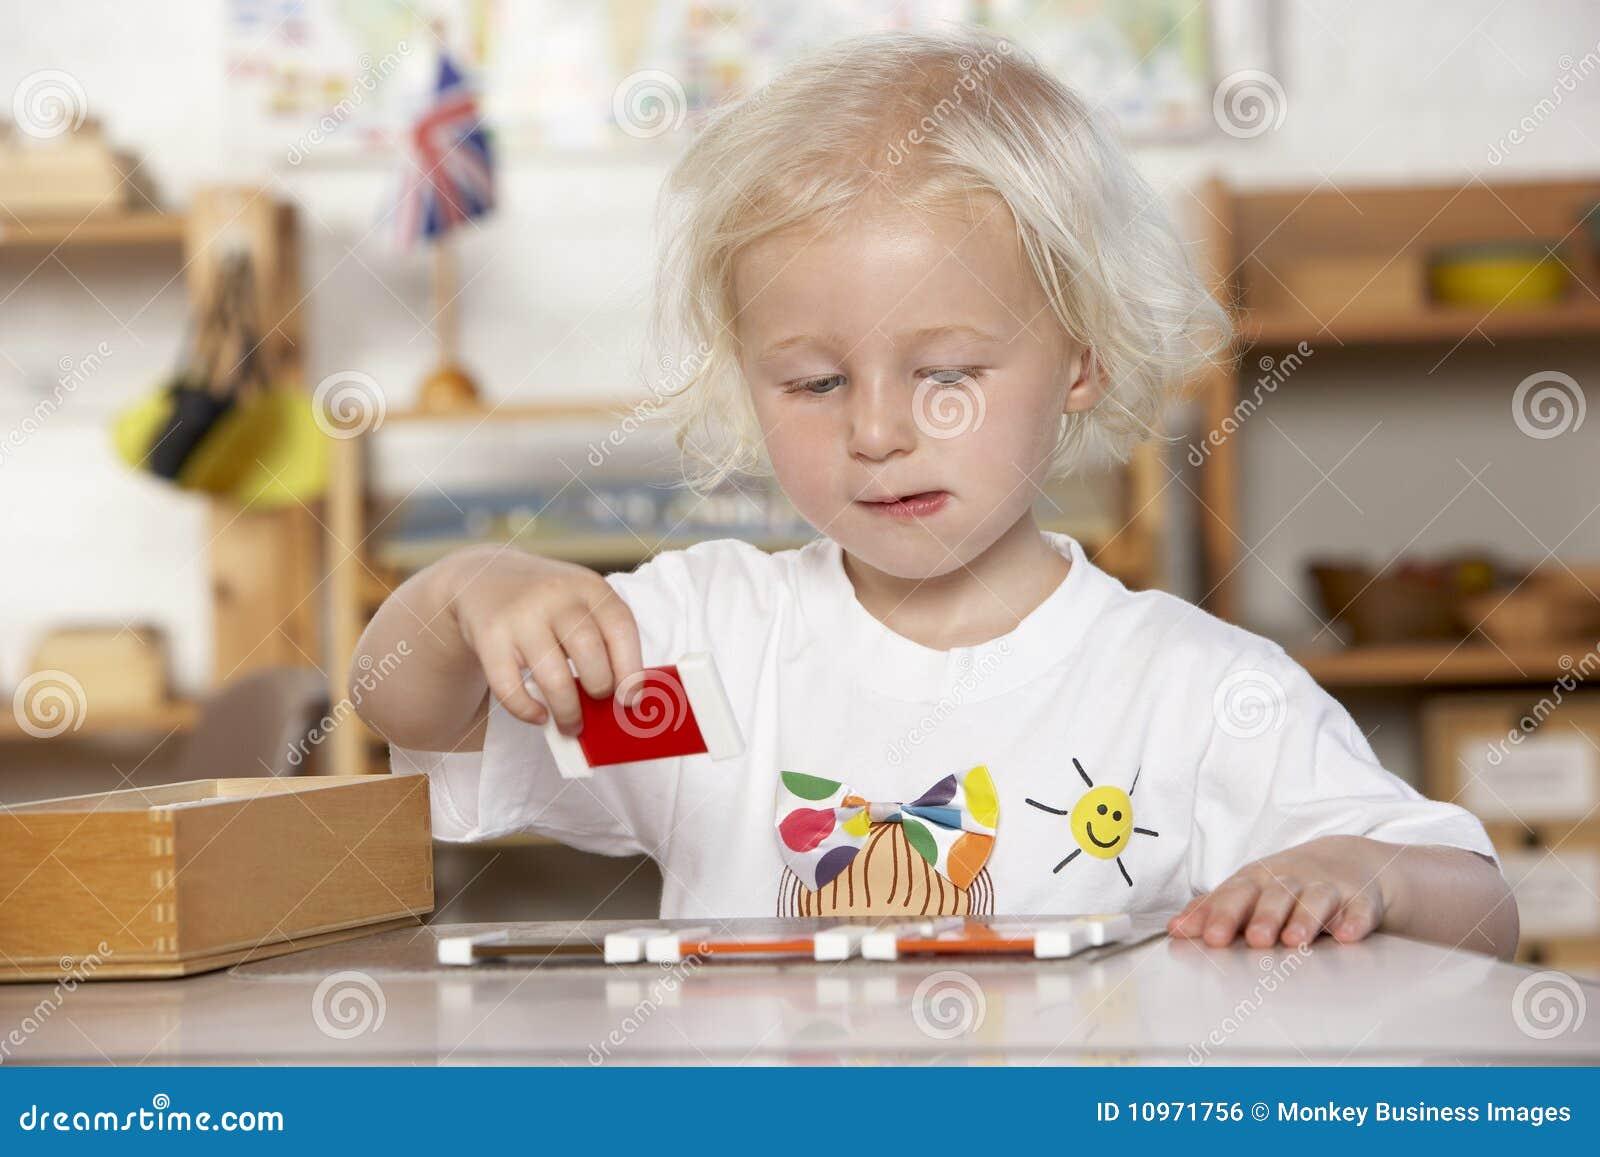 Girl montessori playing pre school young